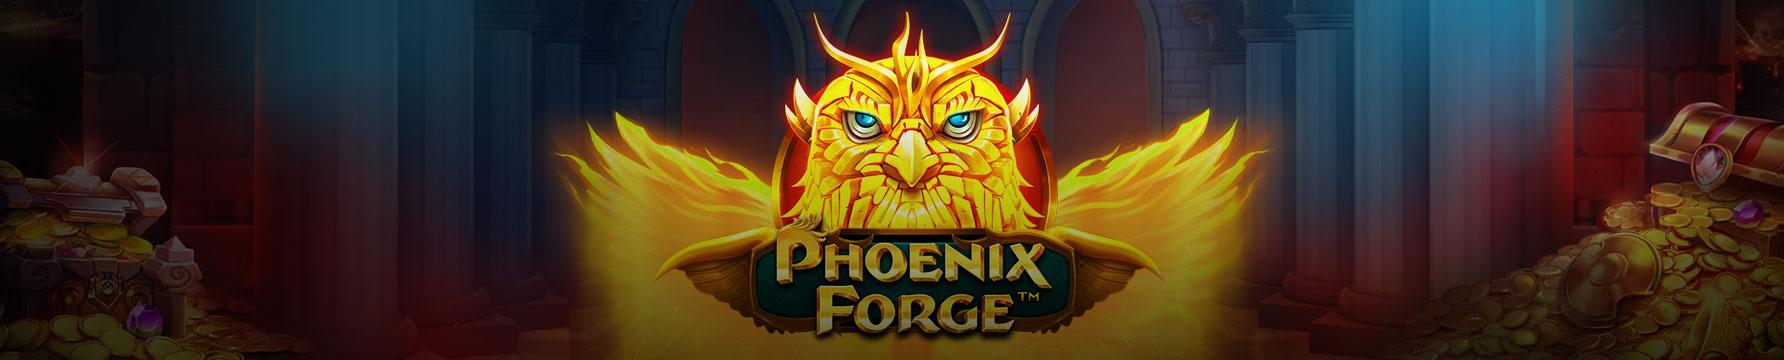 Phoenix Forge CS Pragmatic 2